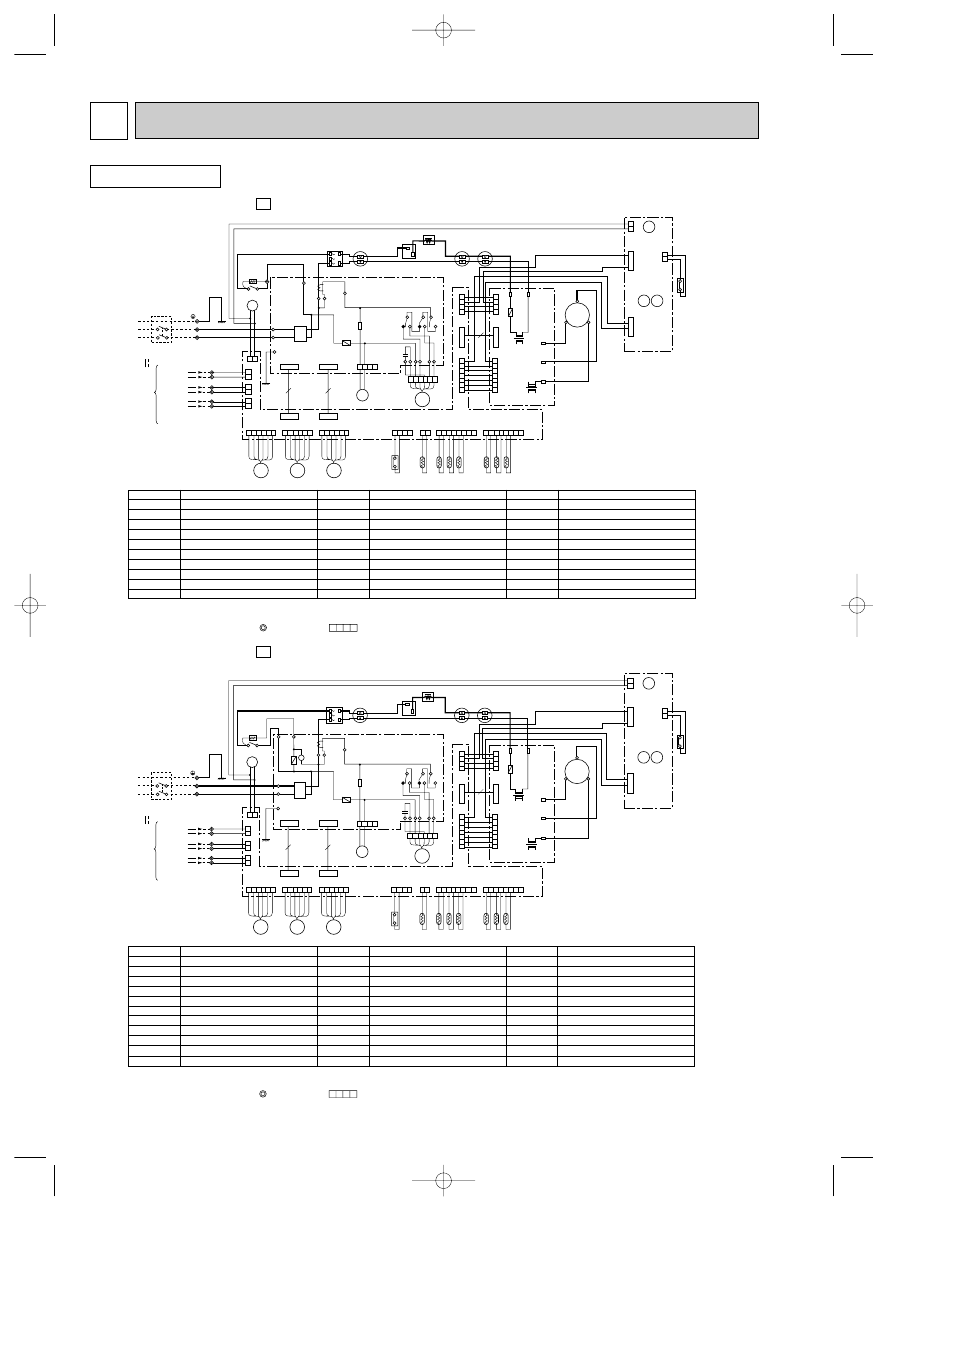 medium resolution of wiring diagram 8 models mxz 24uv outdoor unit mitsubishi mitsubishi electrical wiring diagrams